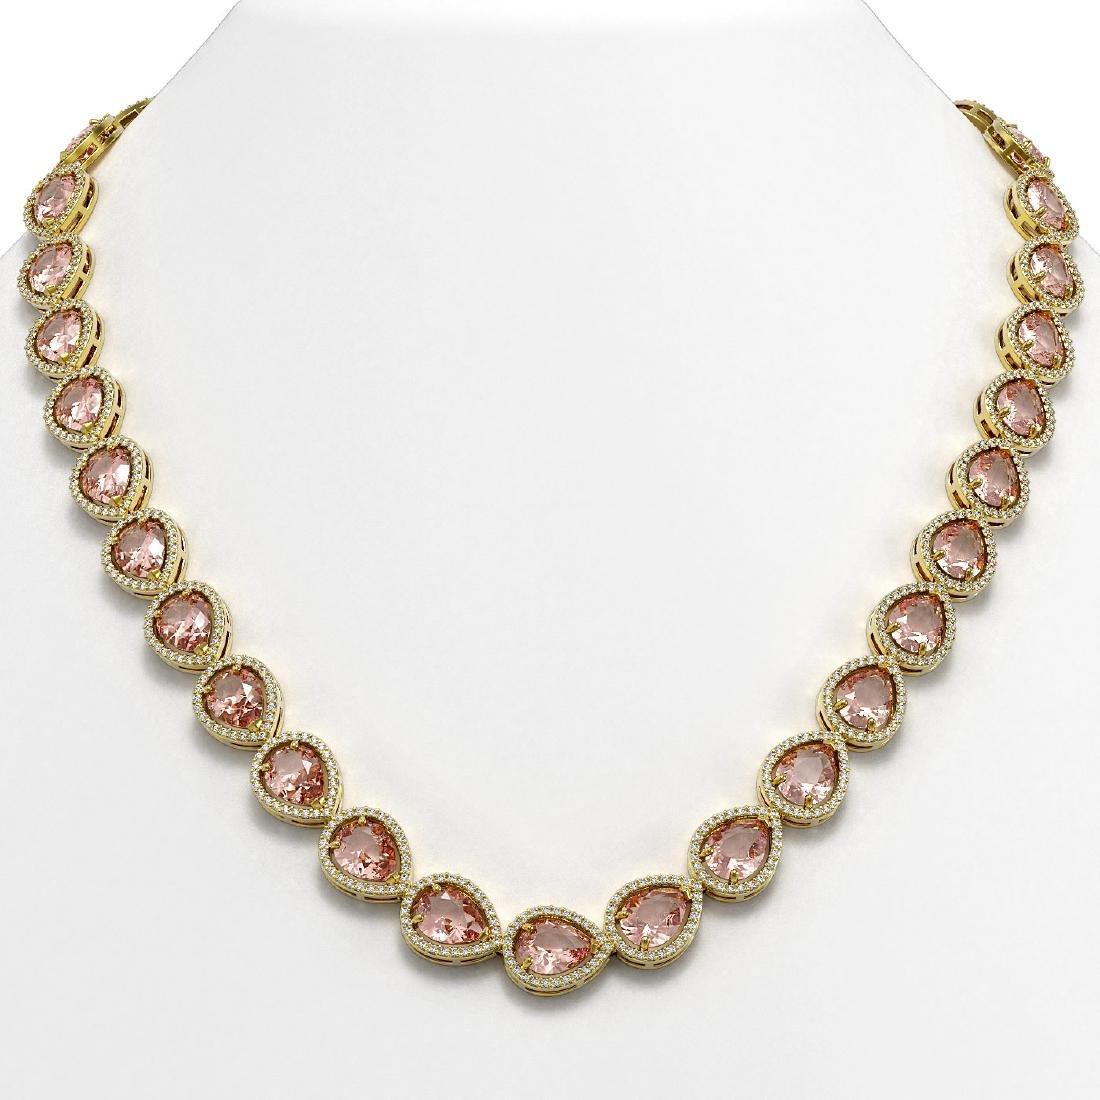 41.6 CTW Morganite & Diamond Halo Necklace 10K Yellow